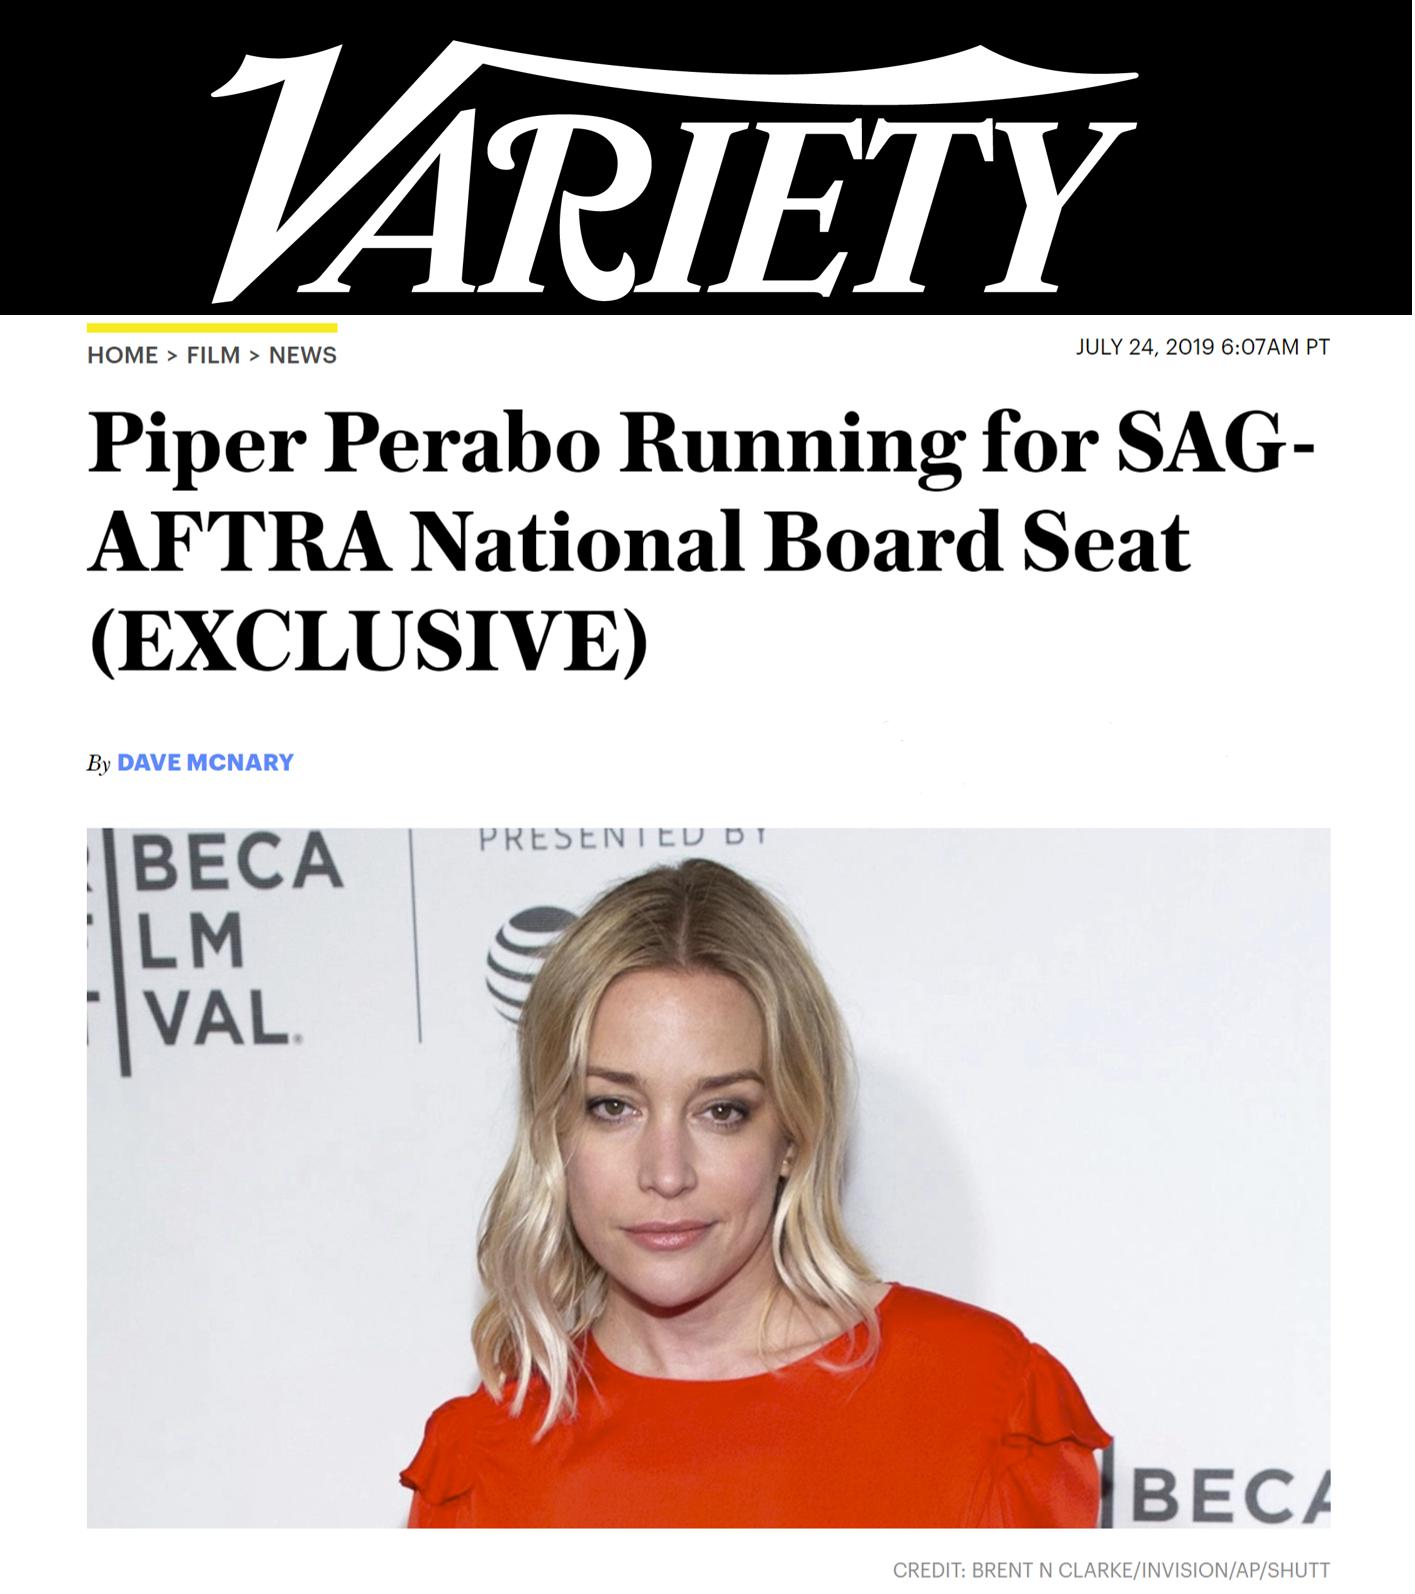 Piper Perabo